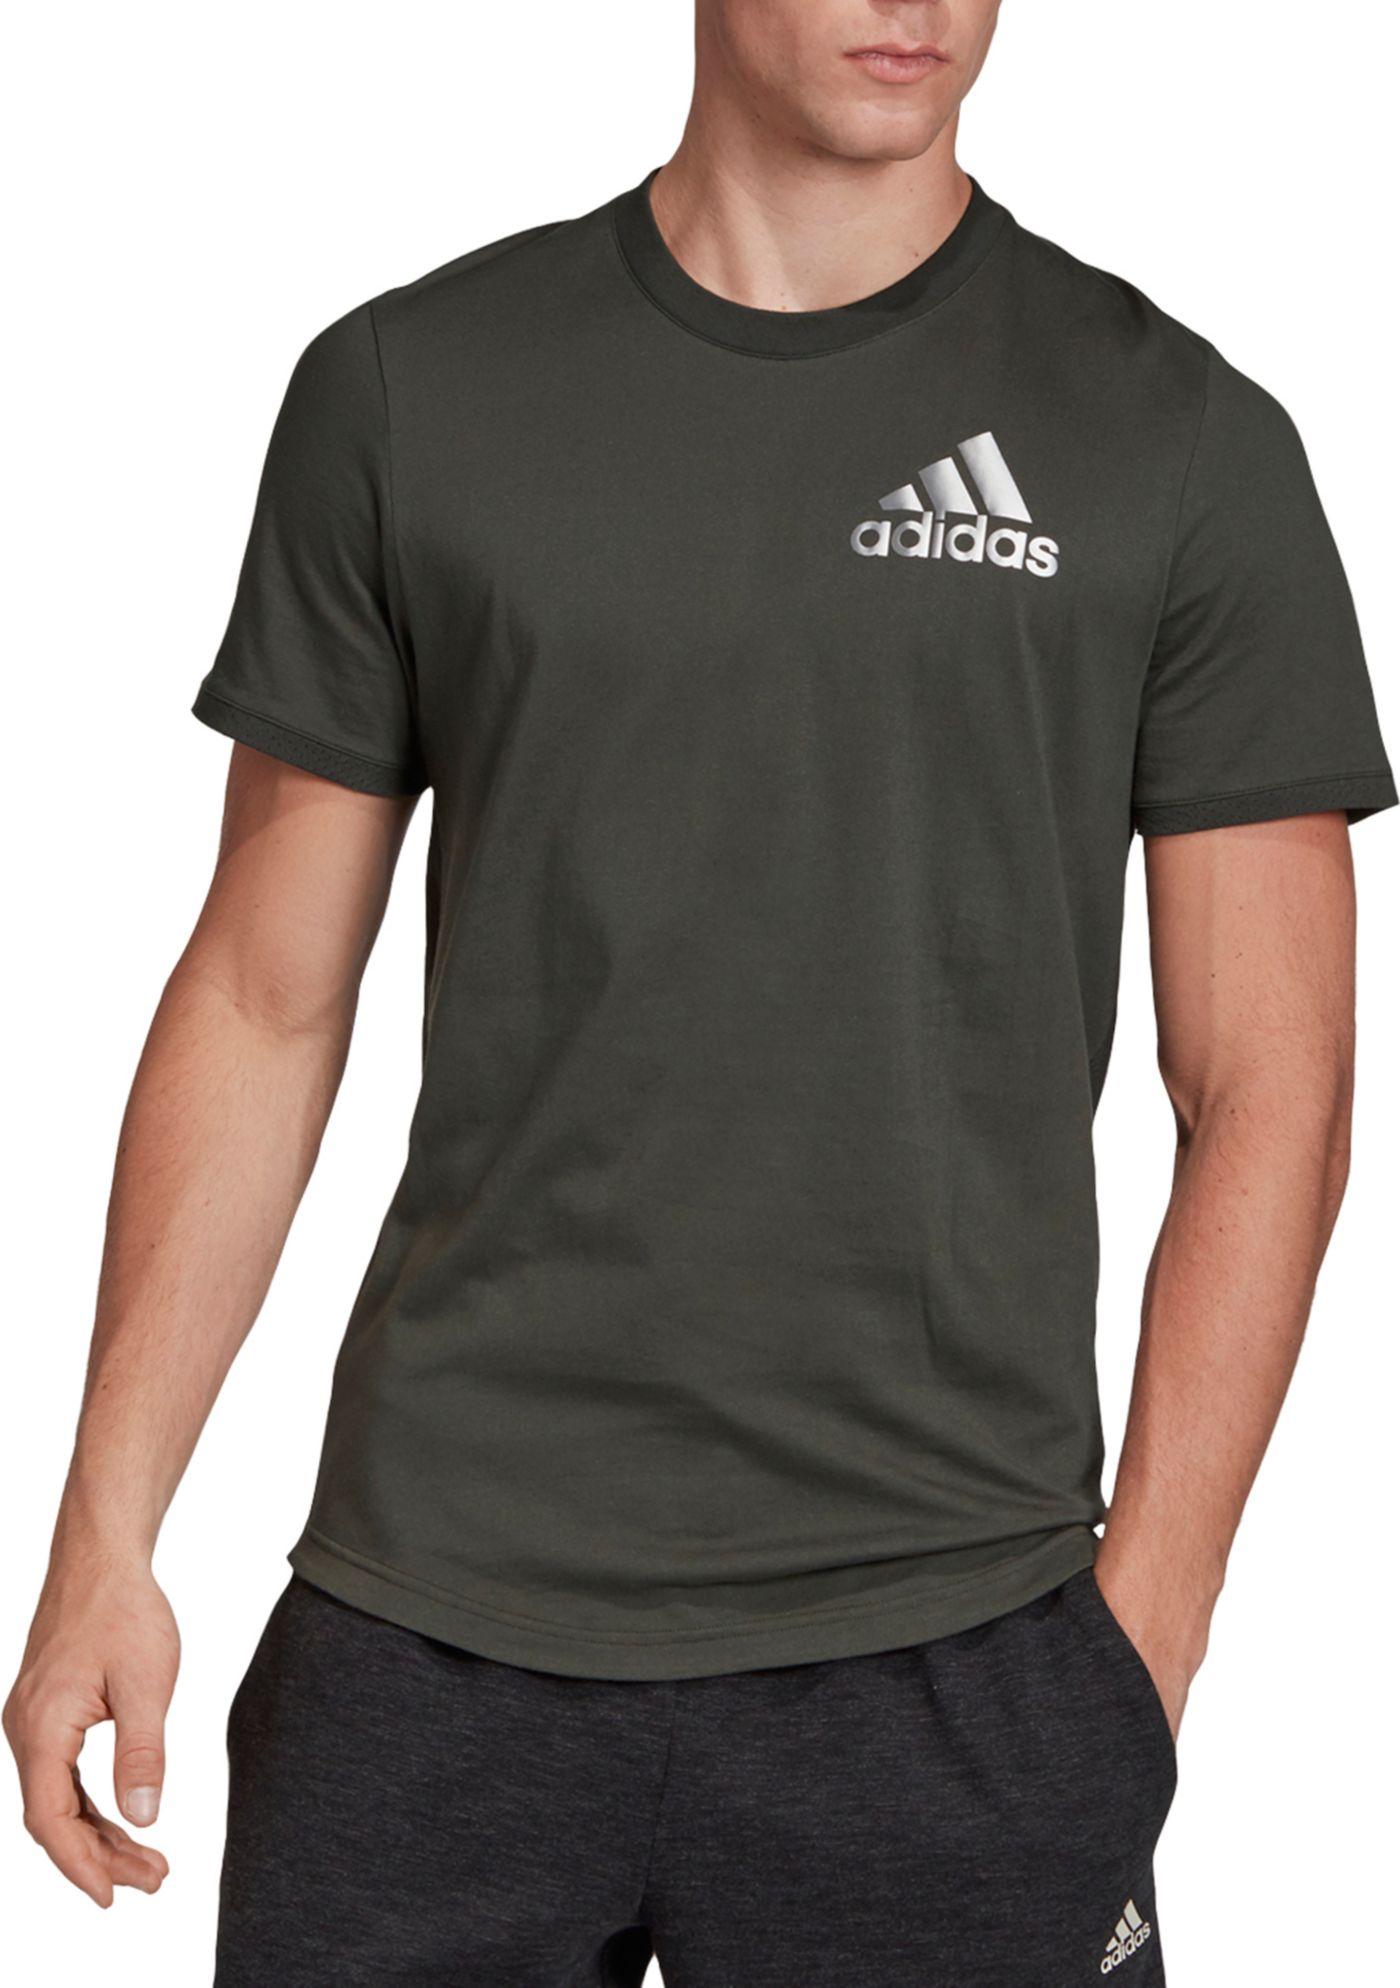 adidas Men's Sport ID Graphic T-Shirt